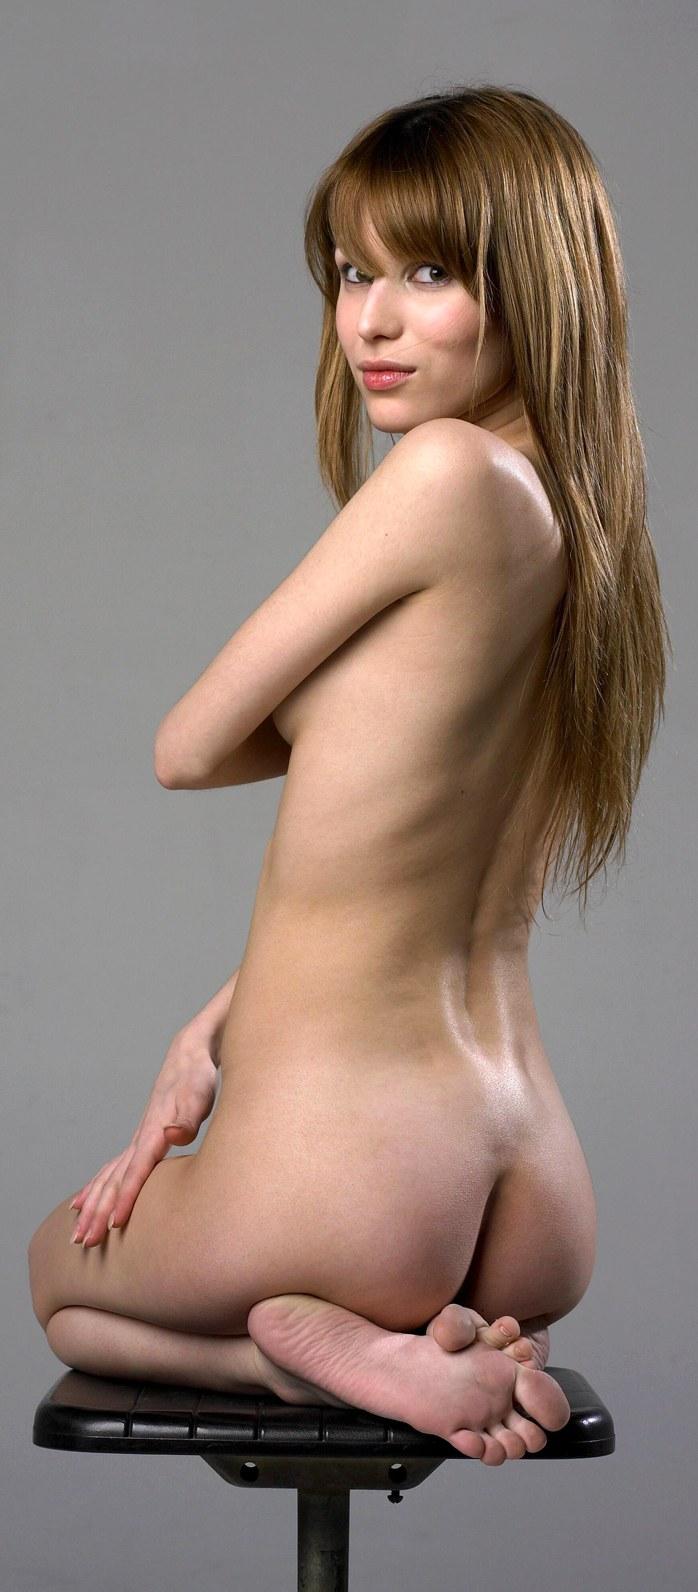 nice girl sex tube